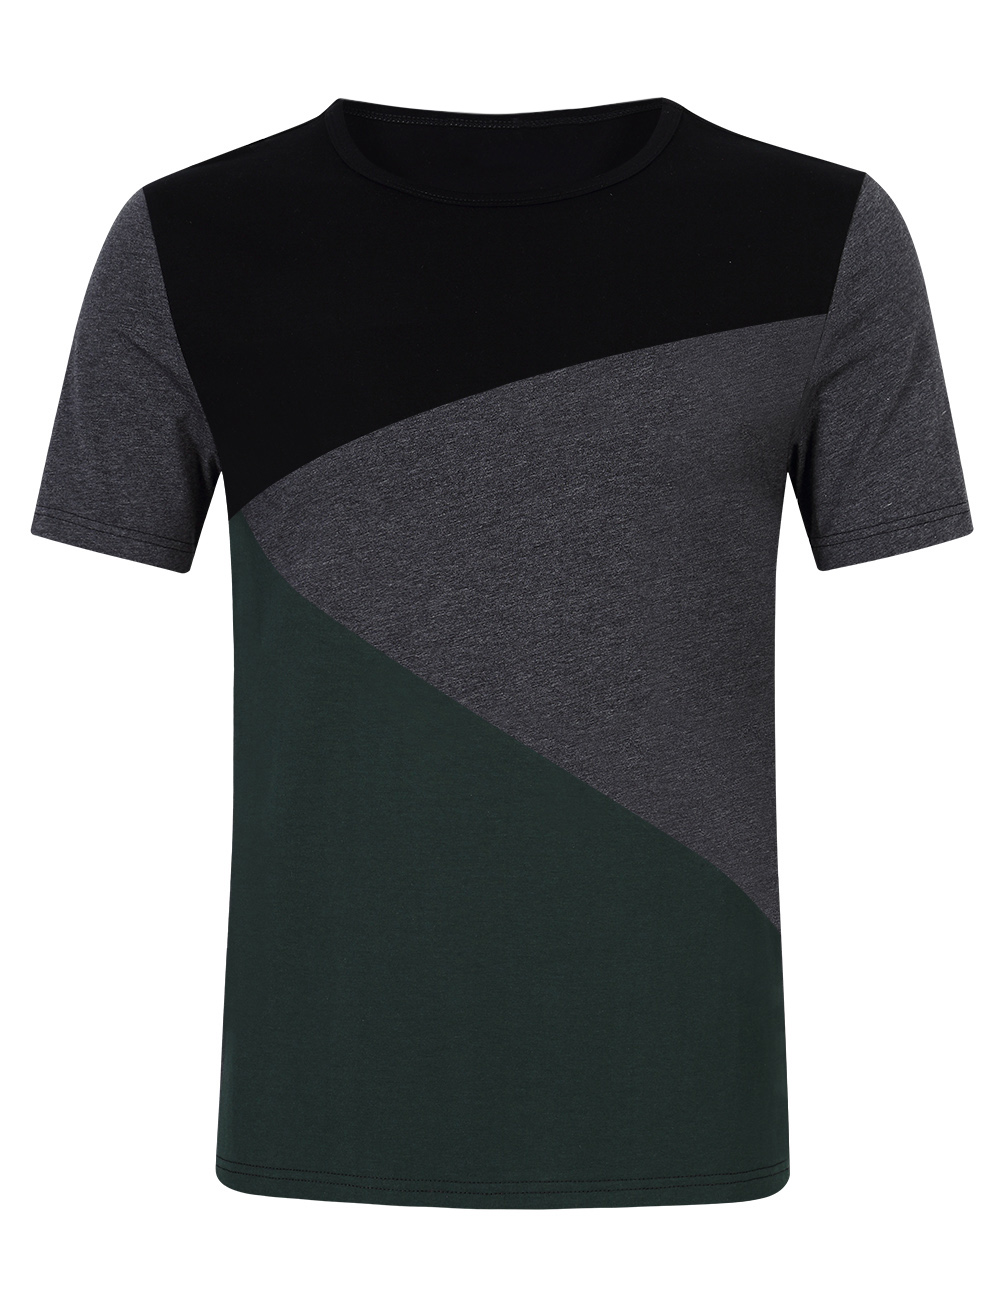 [US Direct] Young Horse Men's Cotton Crewneck Contrast Color Casual T-shirt